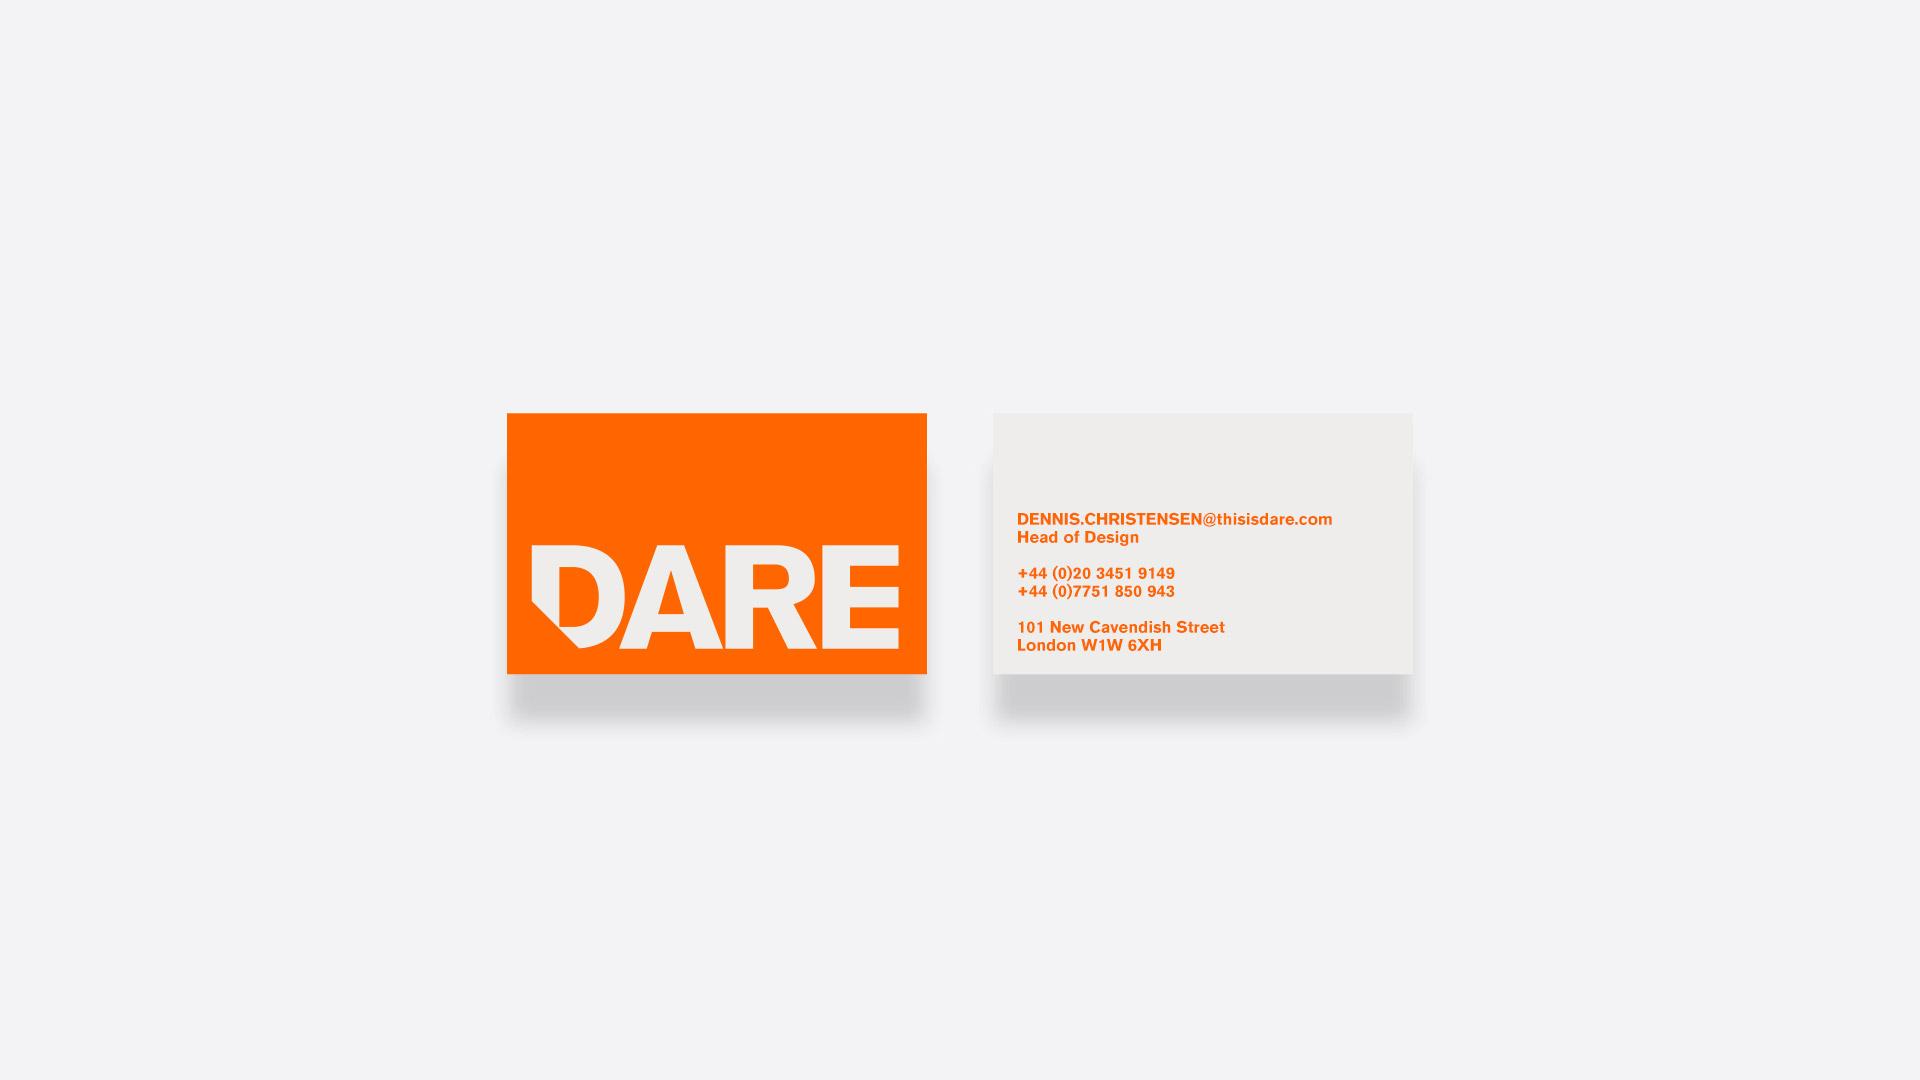 Dare_slide06